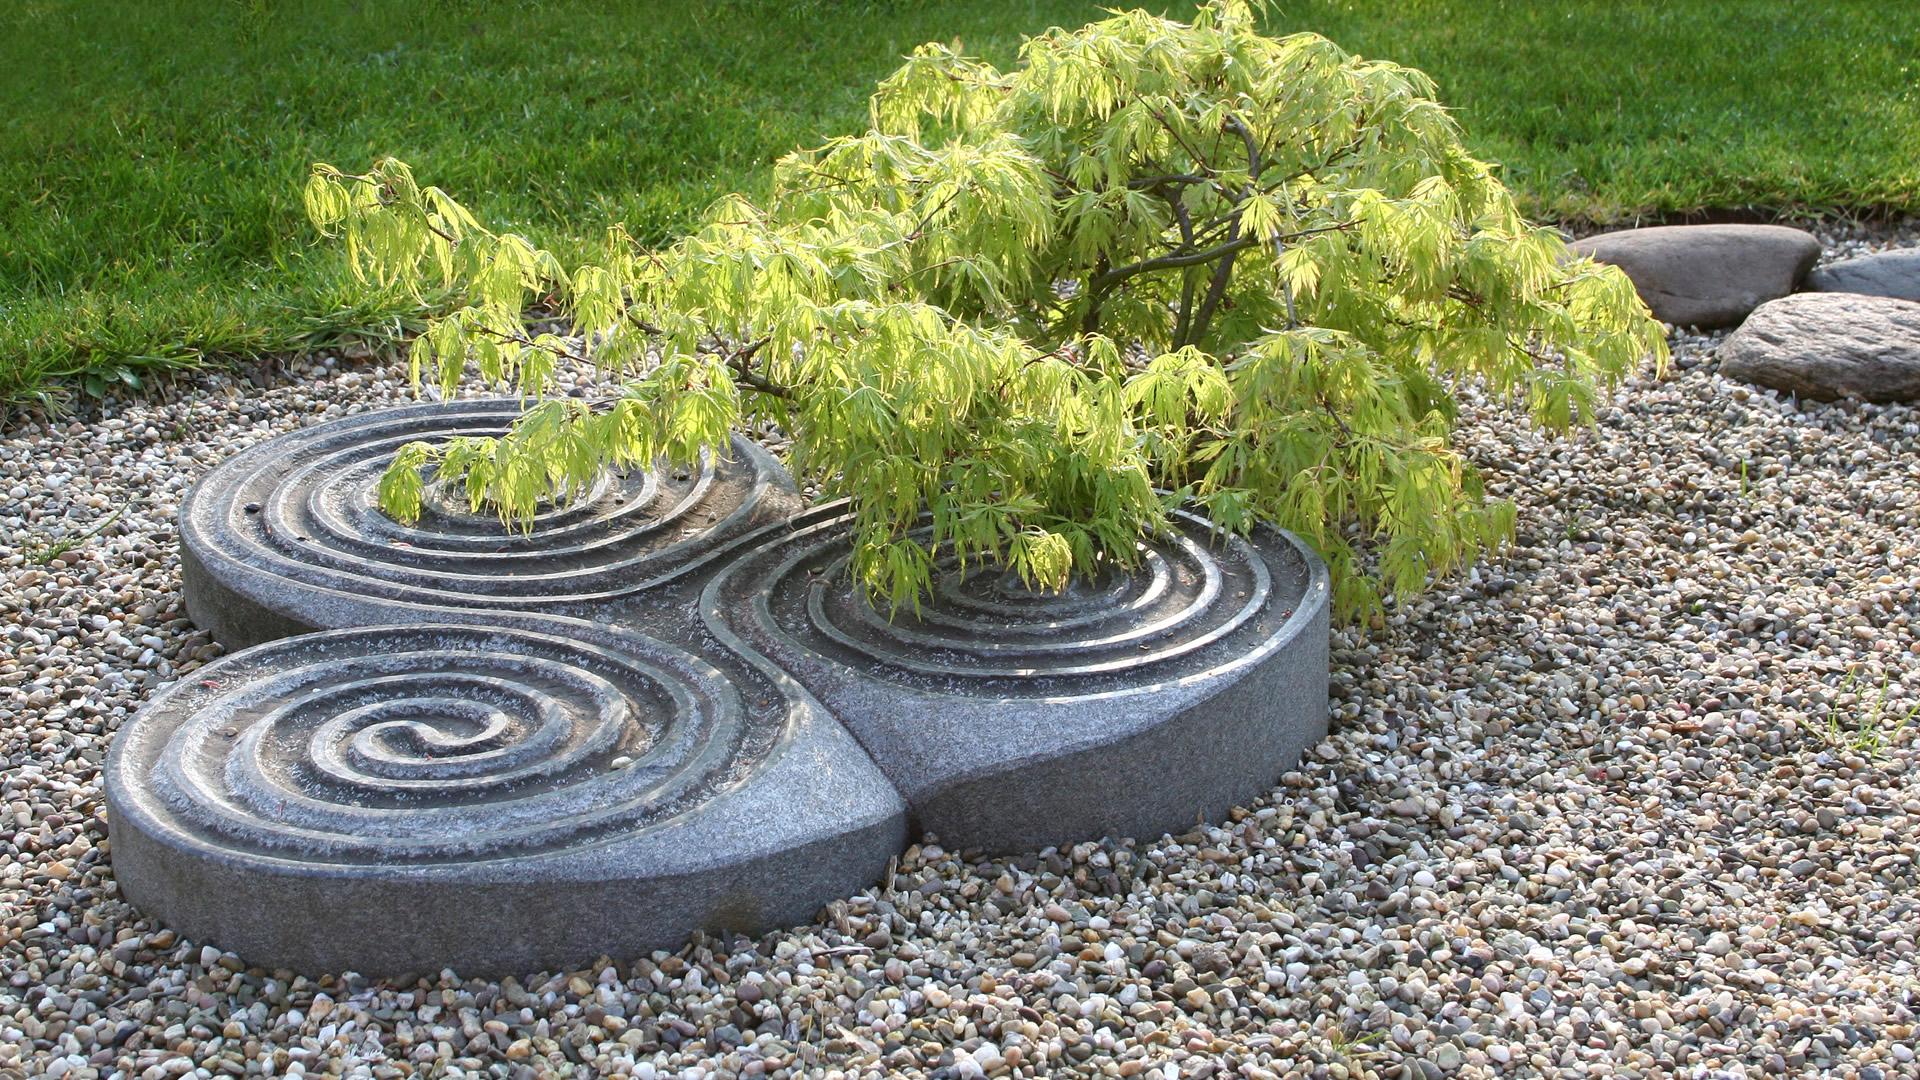 Garten gestaltung garten ideen gestaltung gartens max for Gartengestaltung design